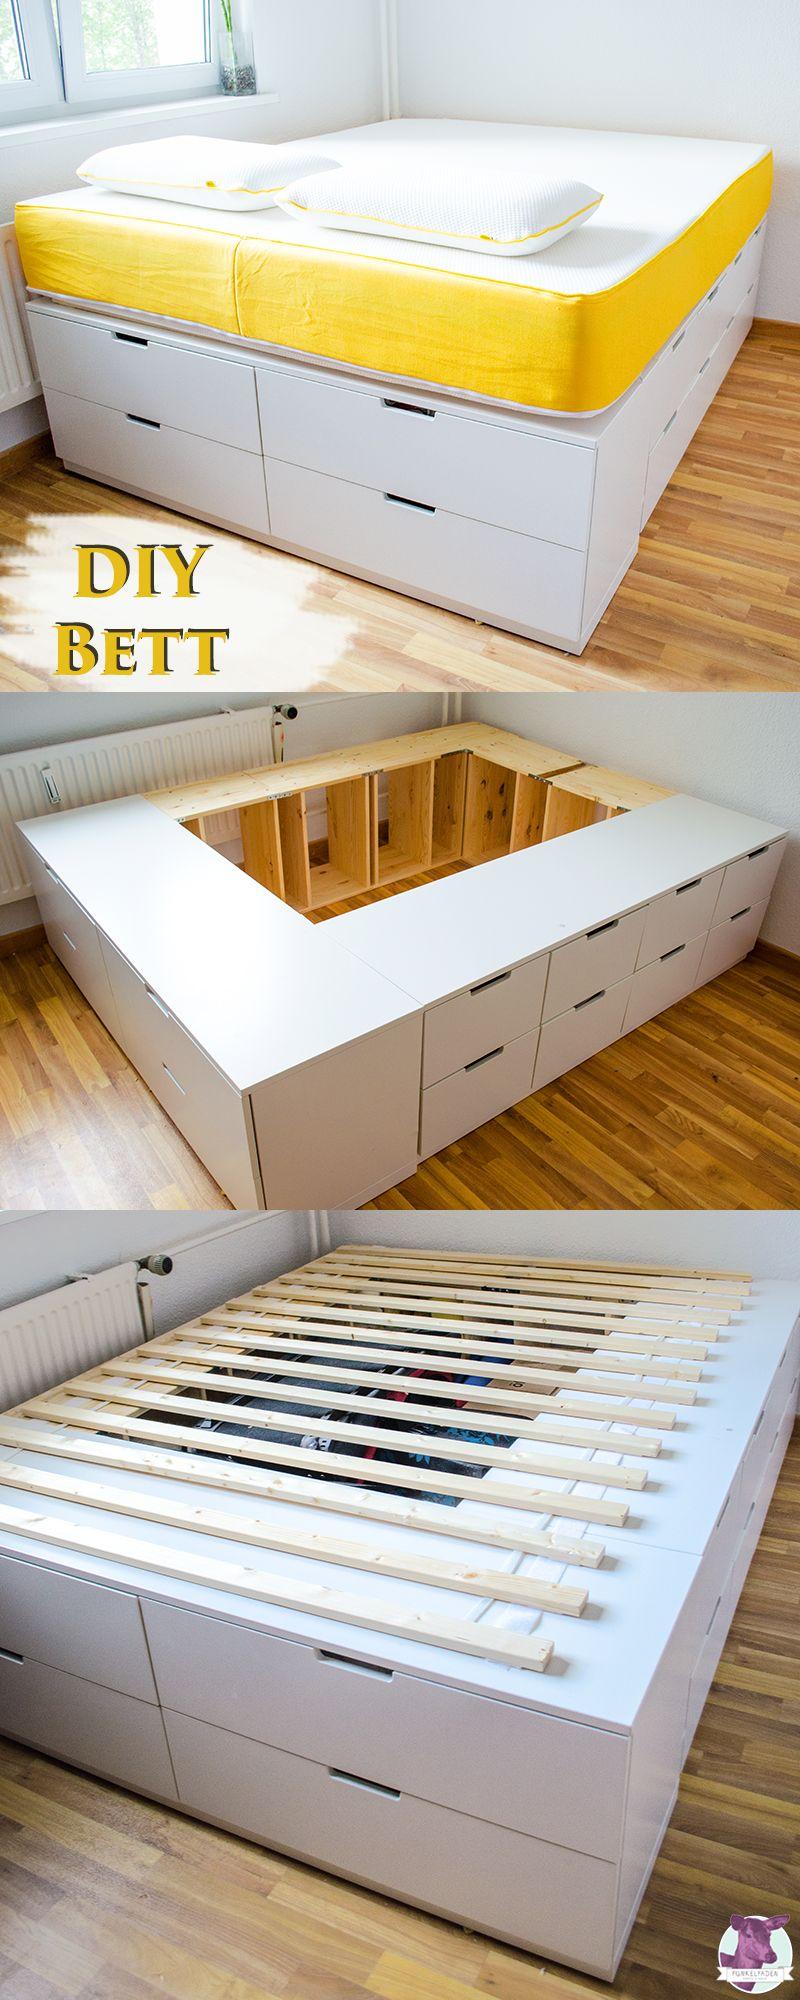 Full Size of Betten Ikea 160x200 Weiss Bett Mit Bettkasten Hemnes Boxspringbett Malm 160x200cm Matratze Und Lattenrost Boxspring Diy Hack Plattform Selber Bauen Aus Kommoden Bett Betten Ikea 160x200